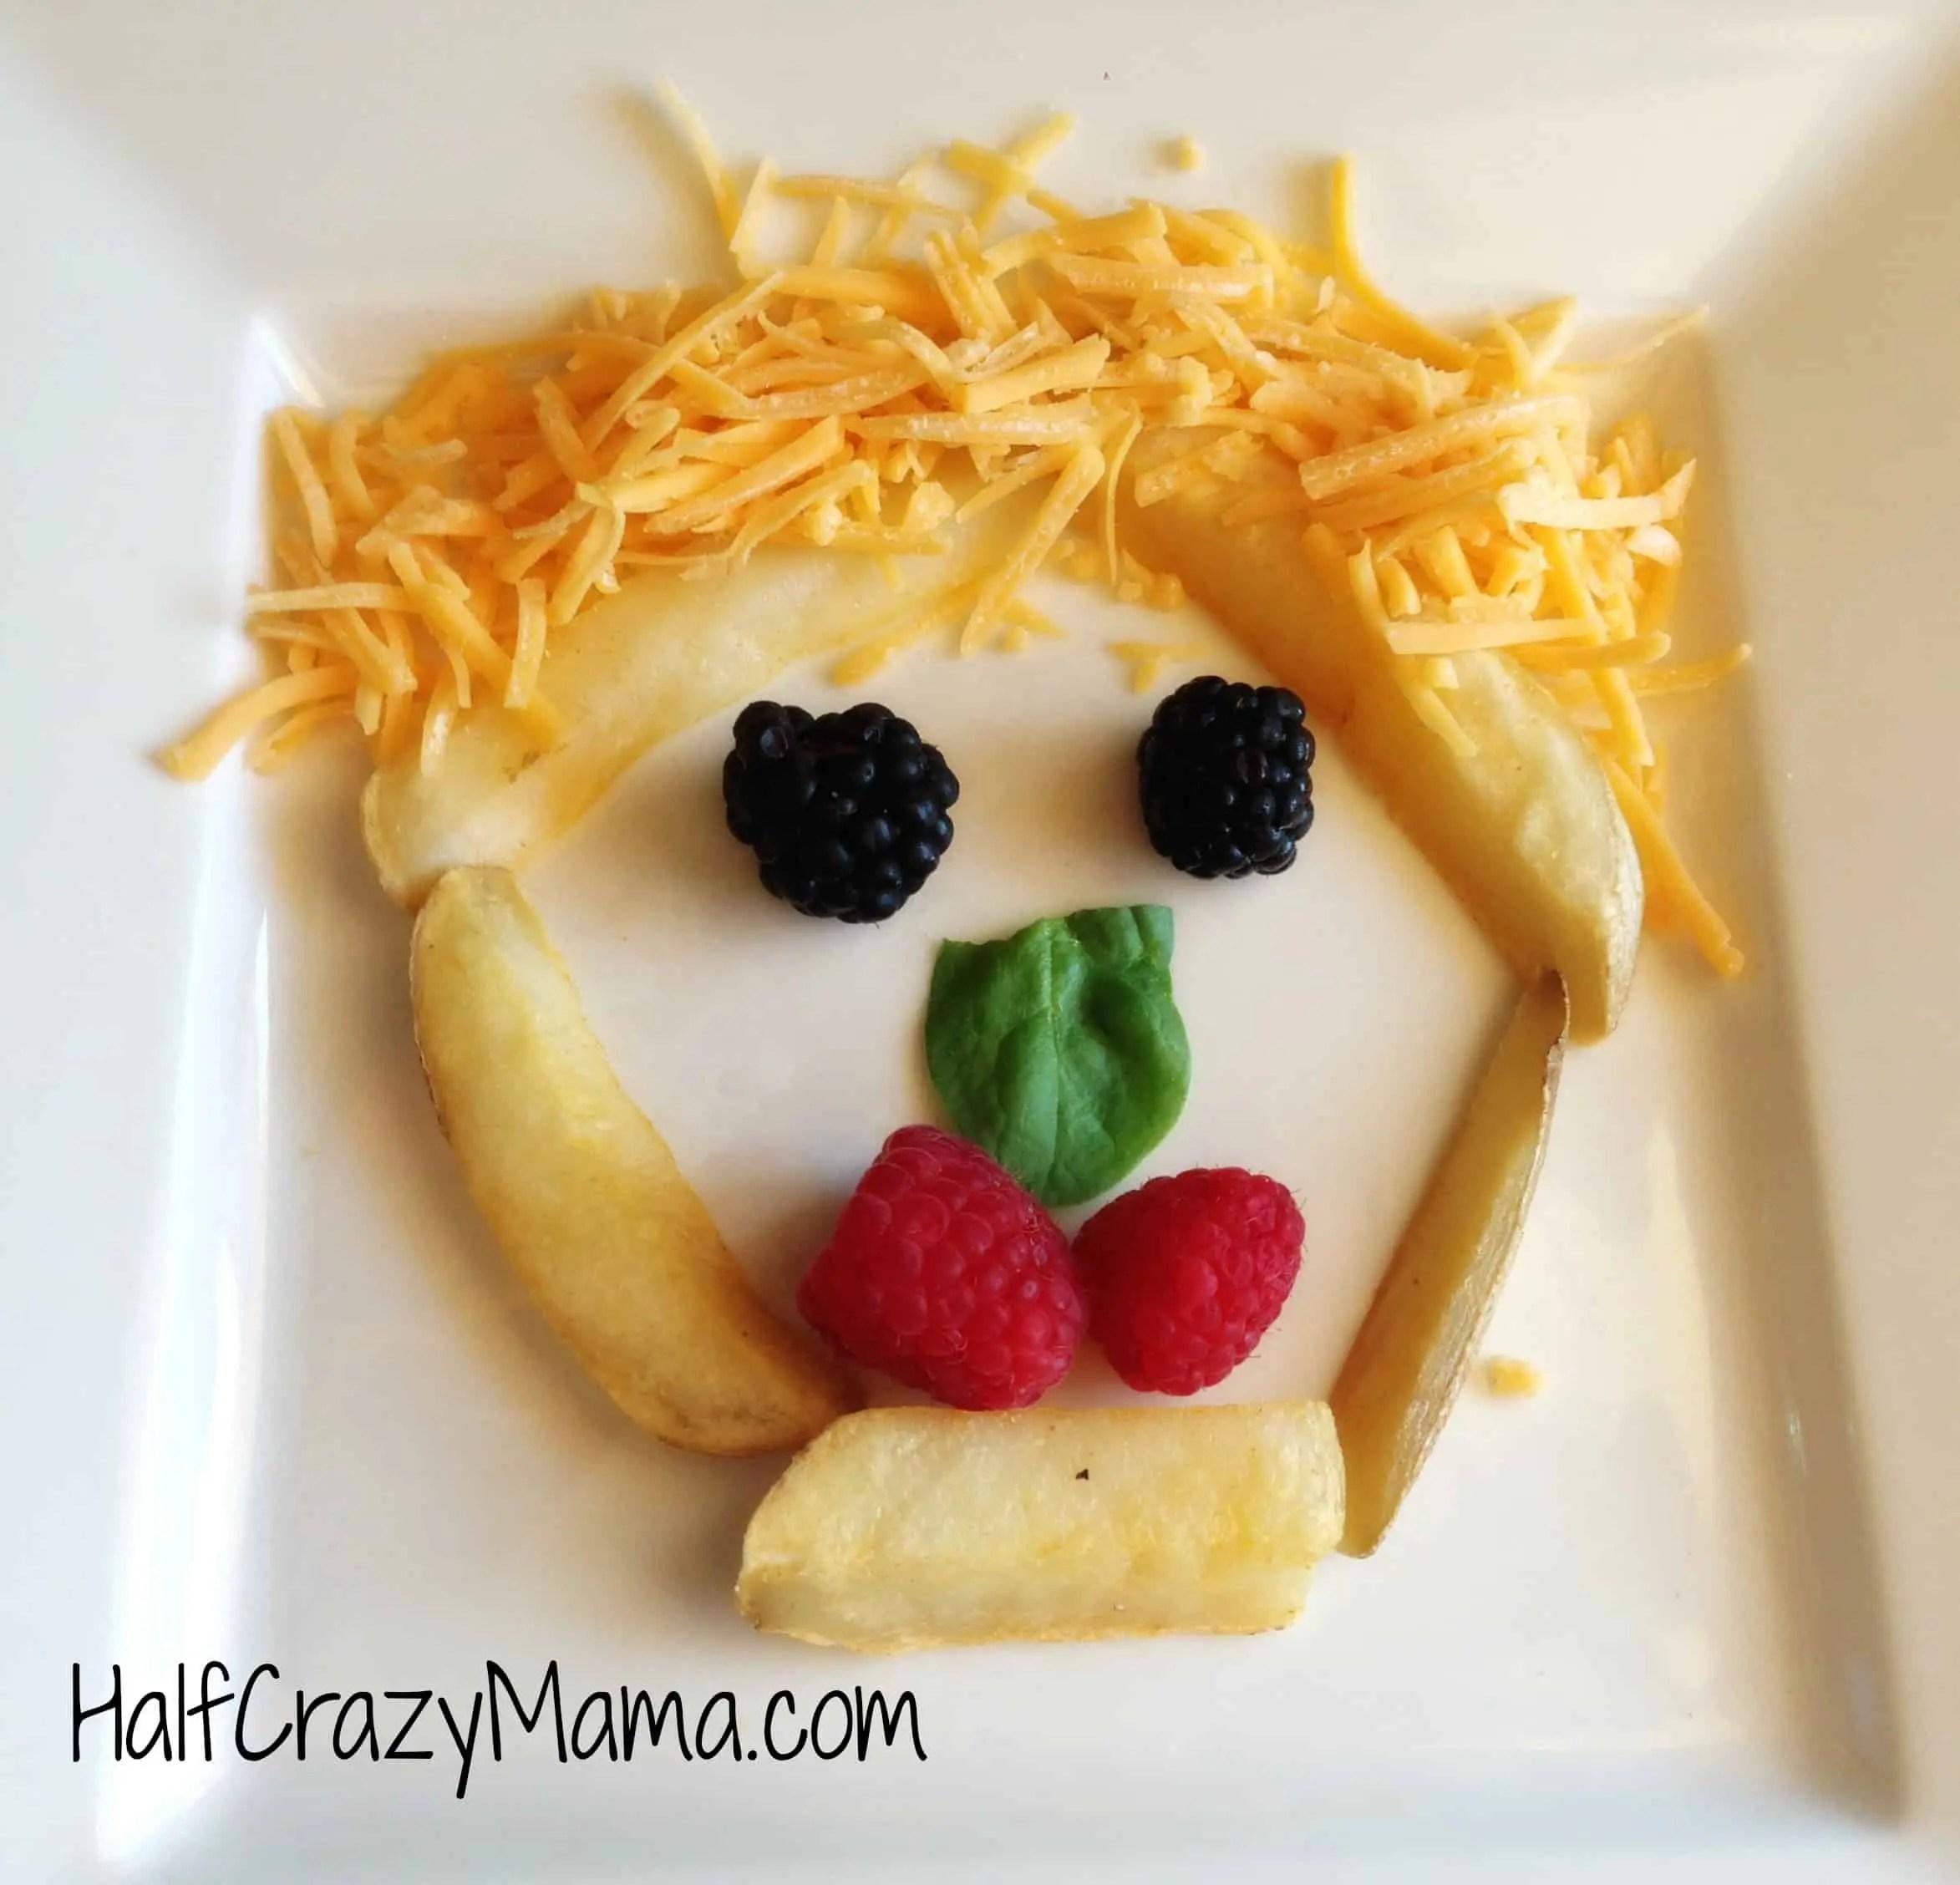 CravOn fries smiley face